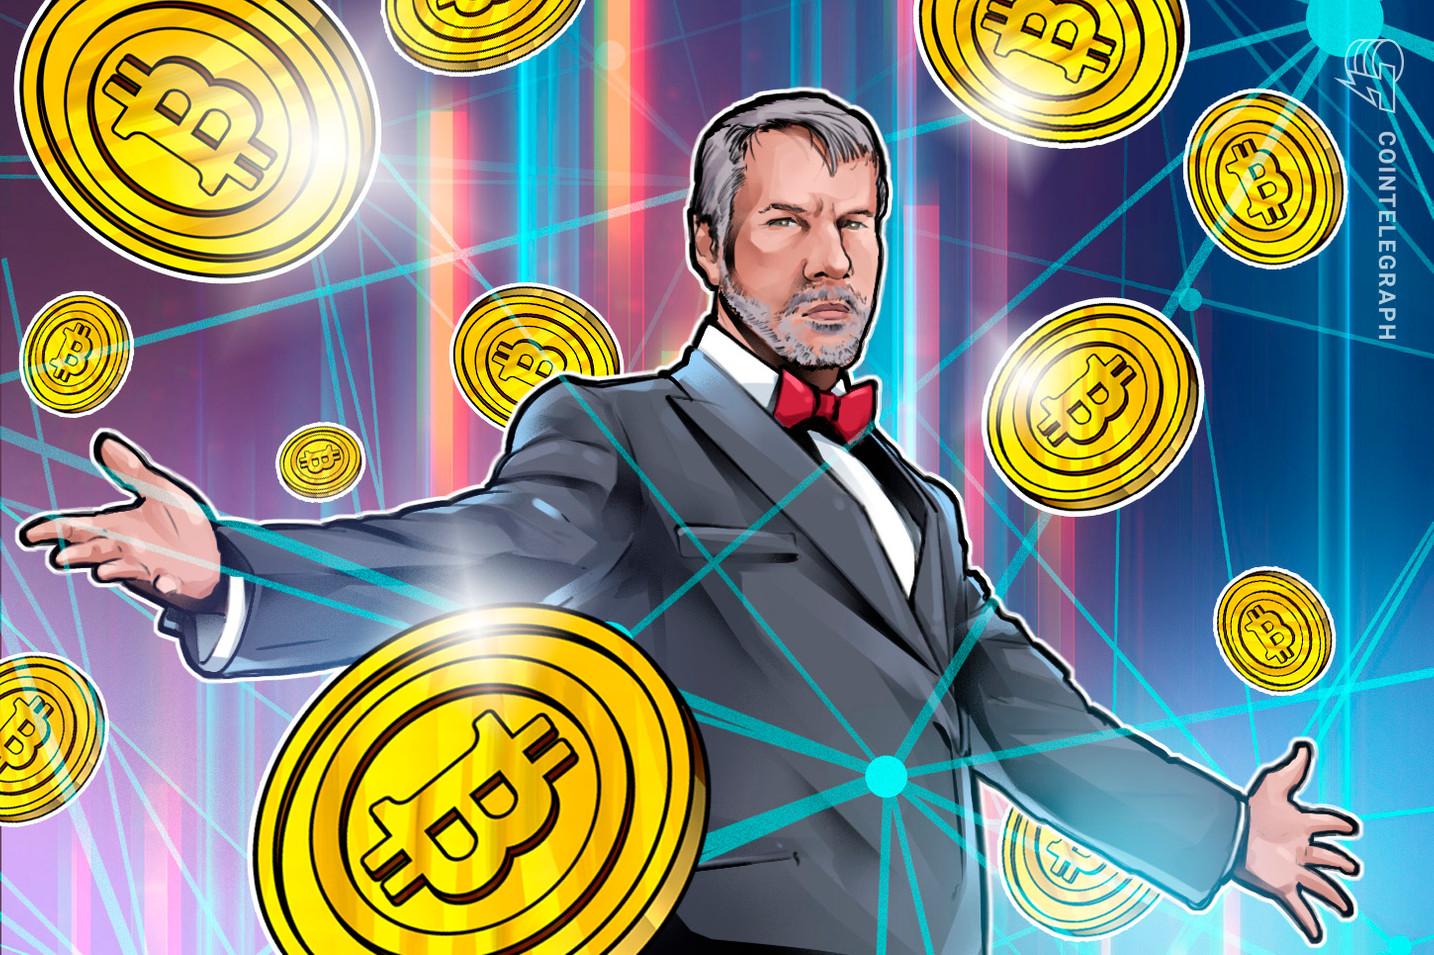 La ballena de Bitcoin MicroStrategy compra 271 BTC adicionales